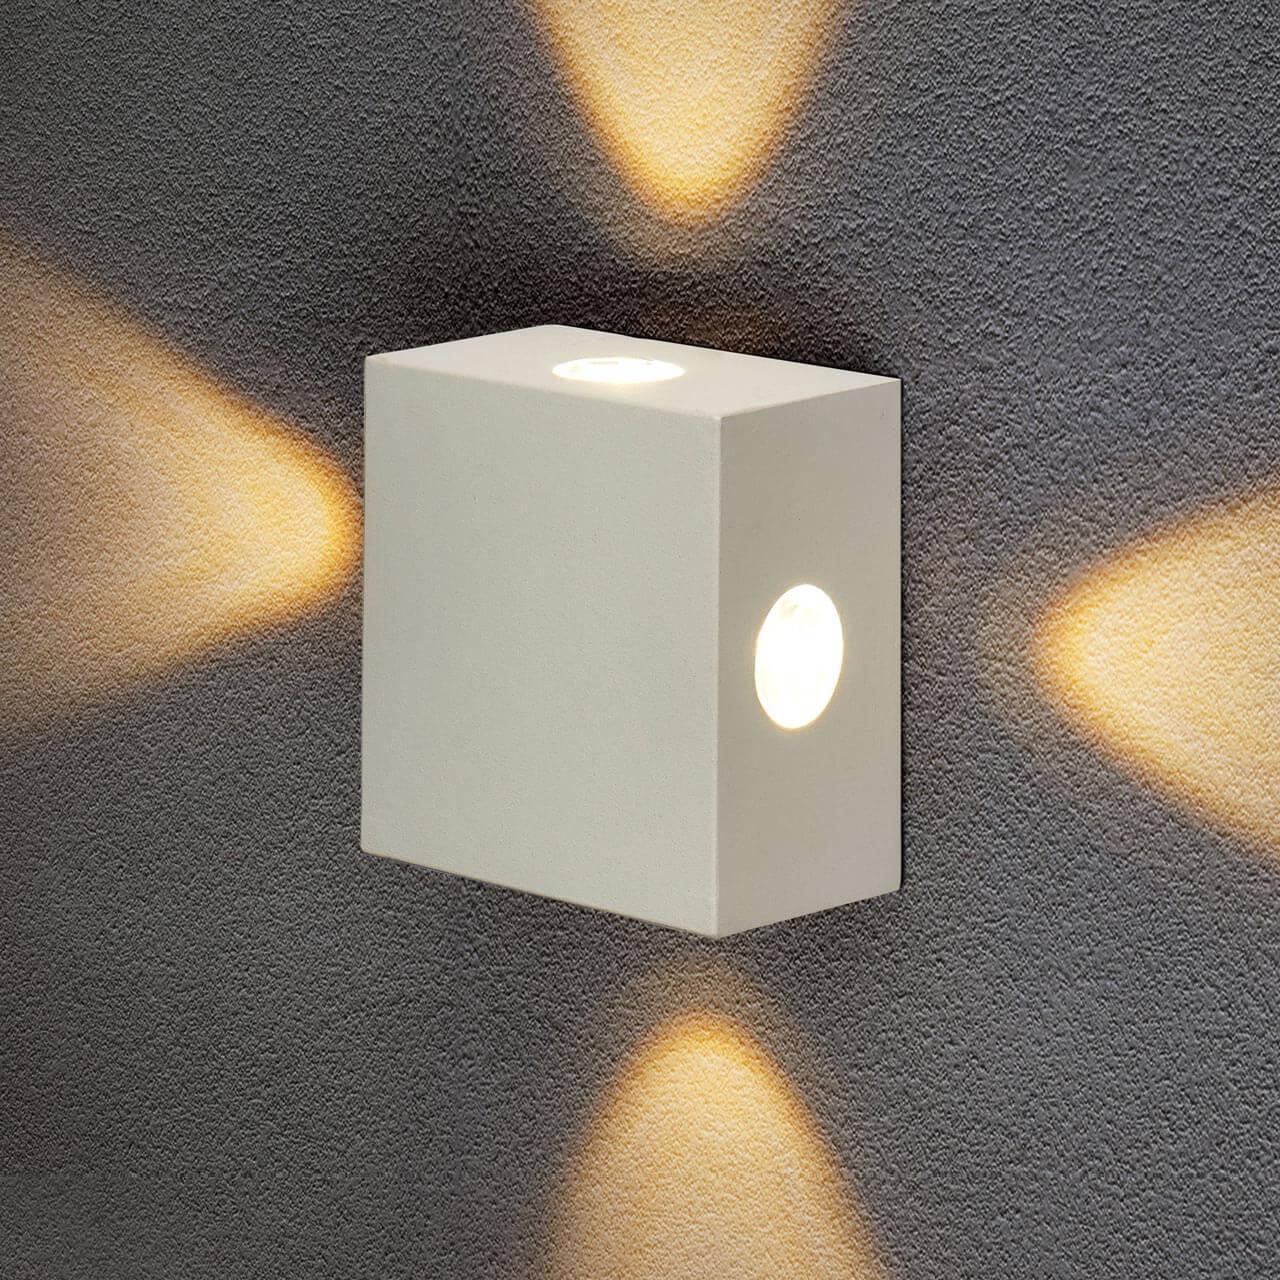 Уличный светильник Elektrostandard 4690389116391, LED уличный настенный светодиодный светильник elektrostandard 1605 techno led sokar графит 4690389086038